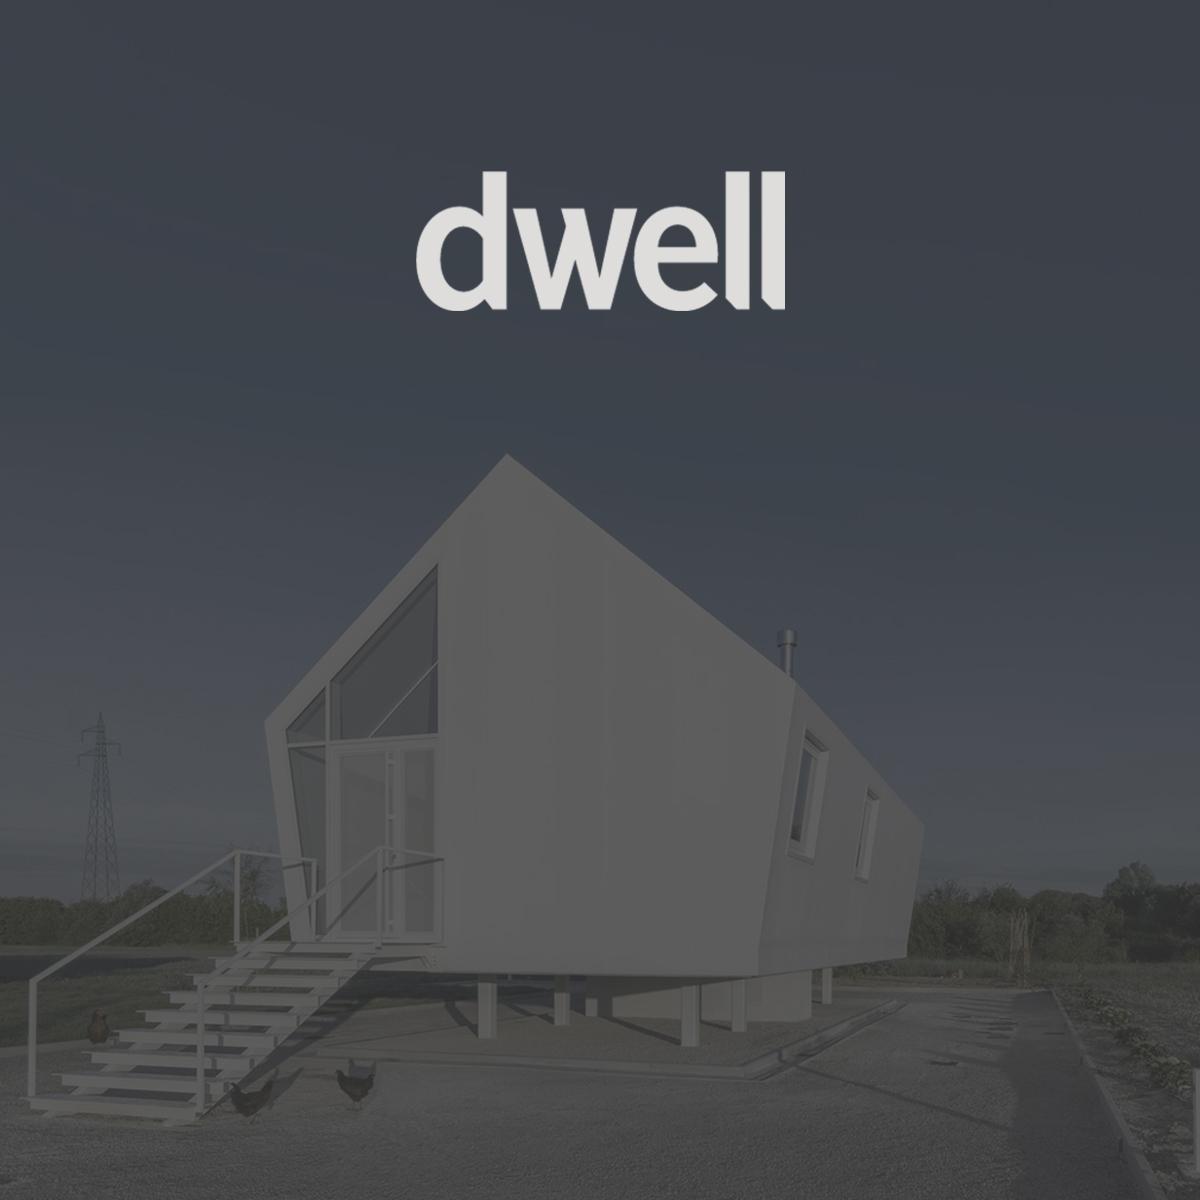 dwell-media